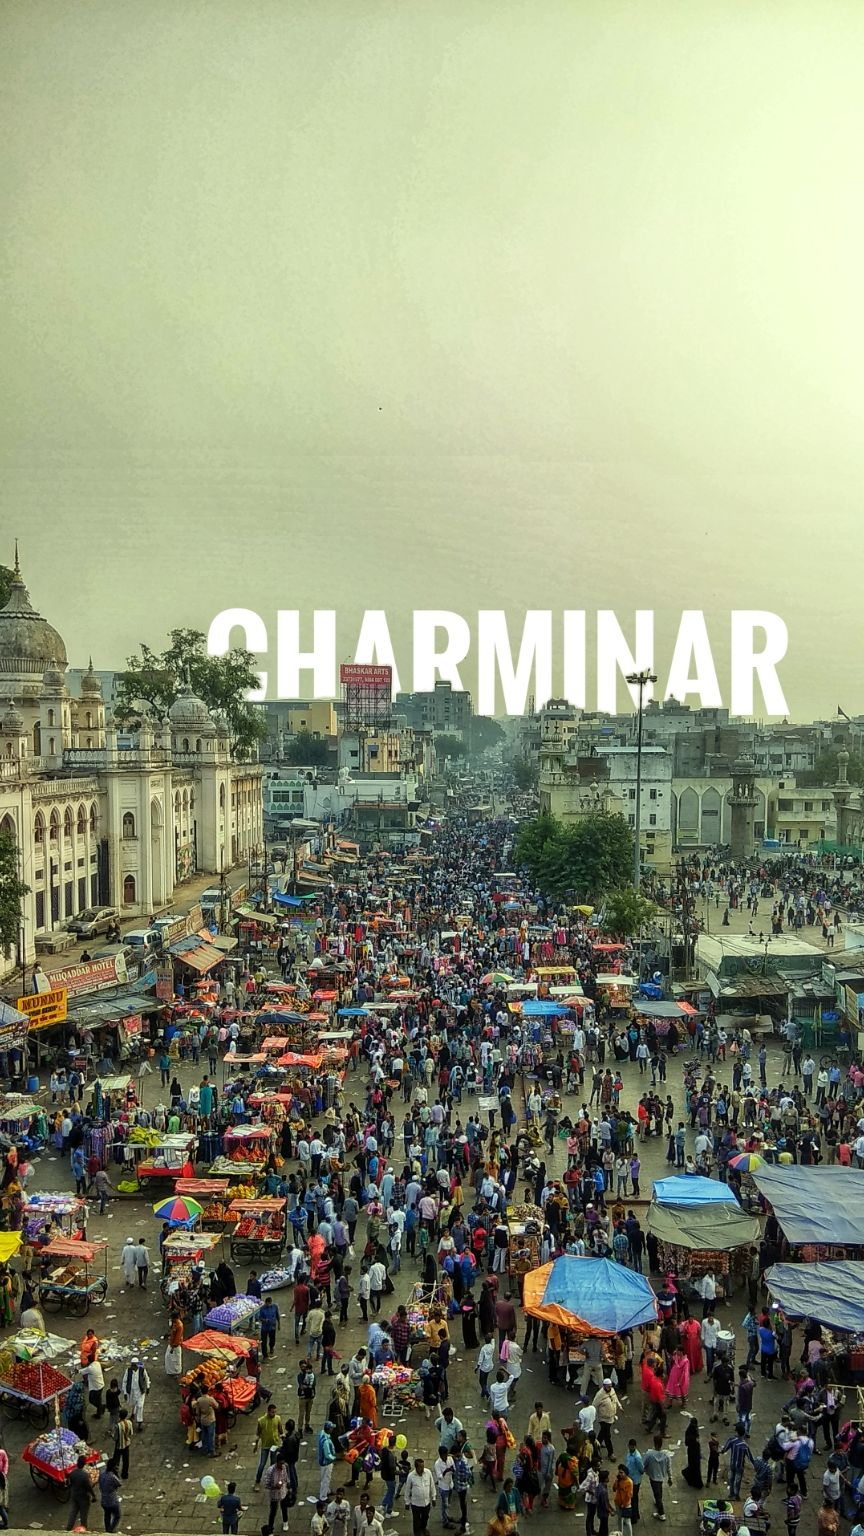 Photo of Charminar (Old City) By Santosh sadhu